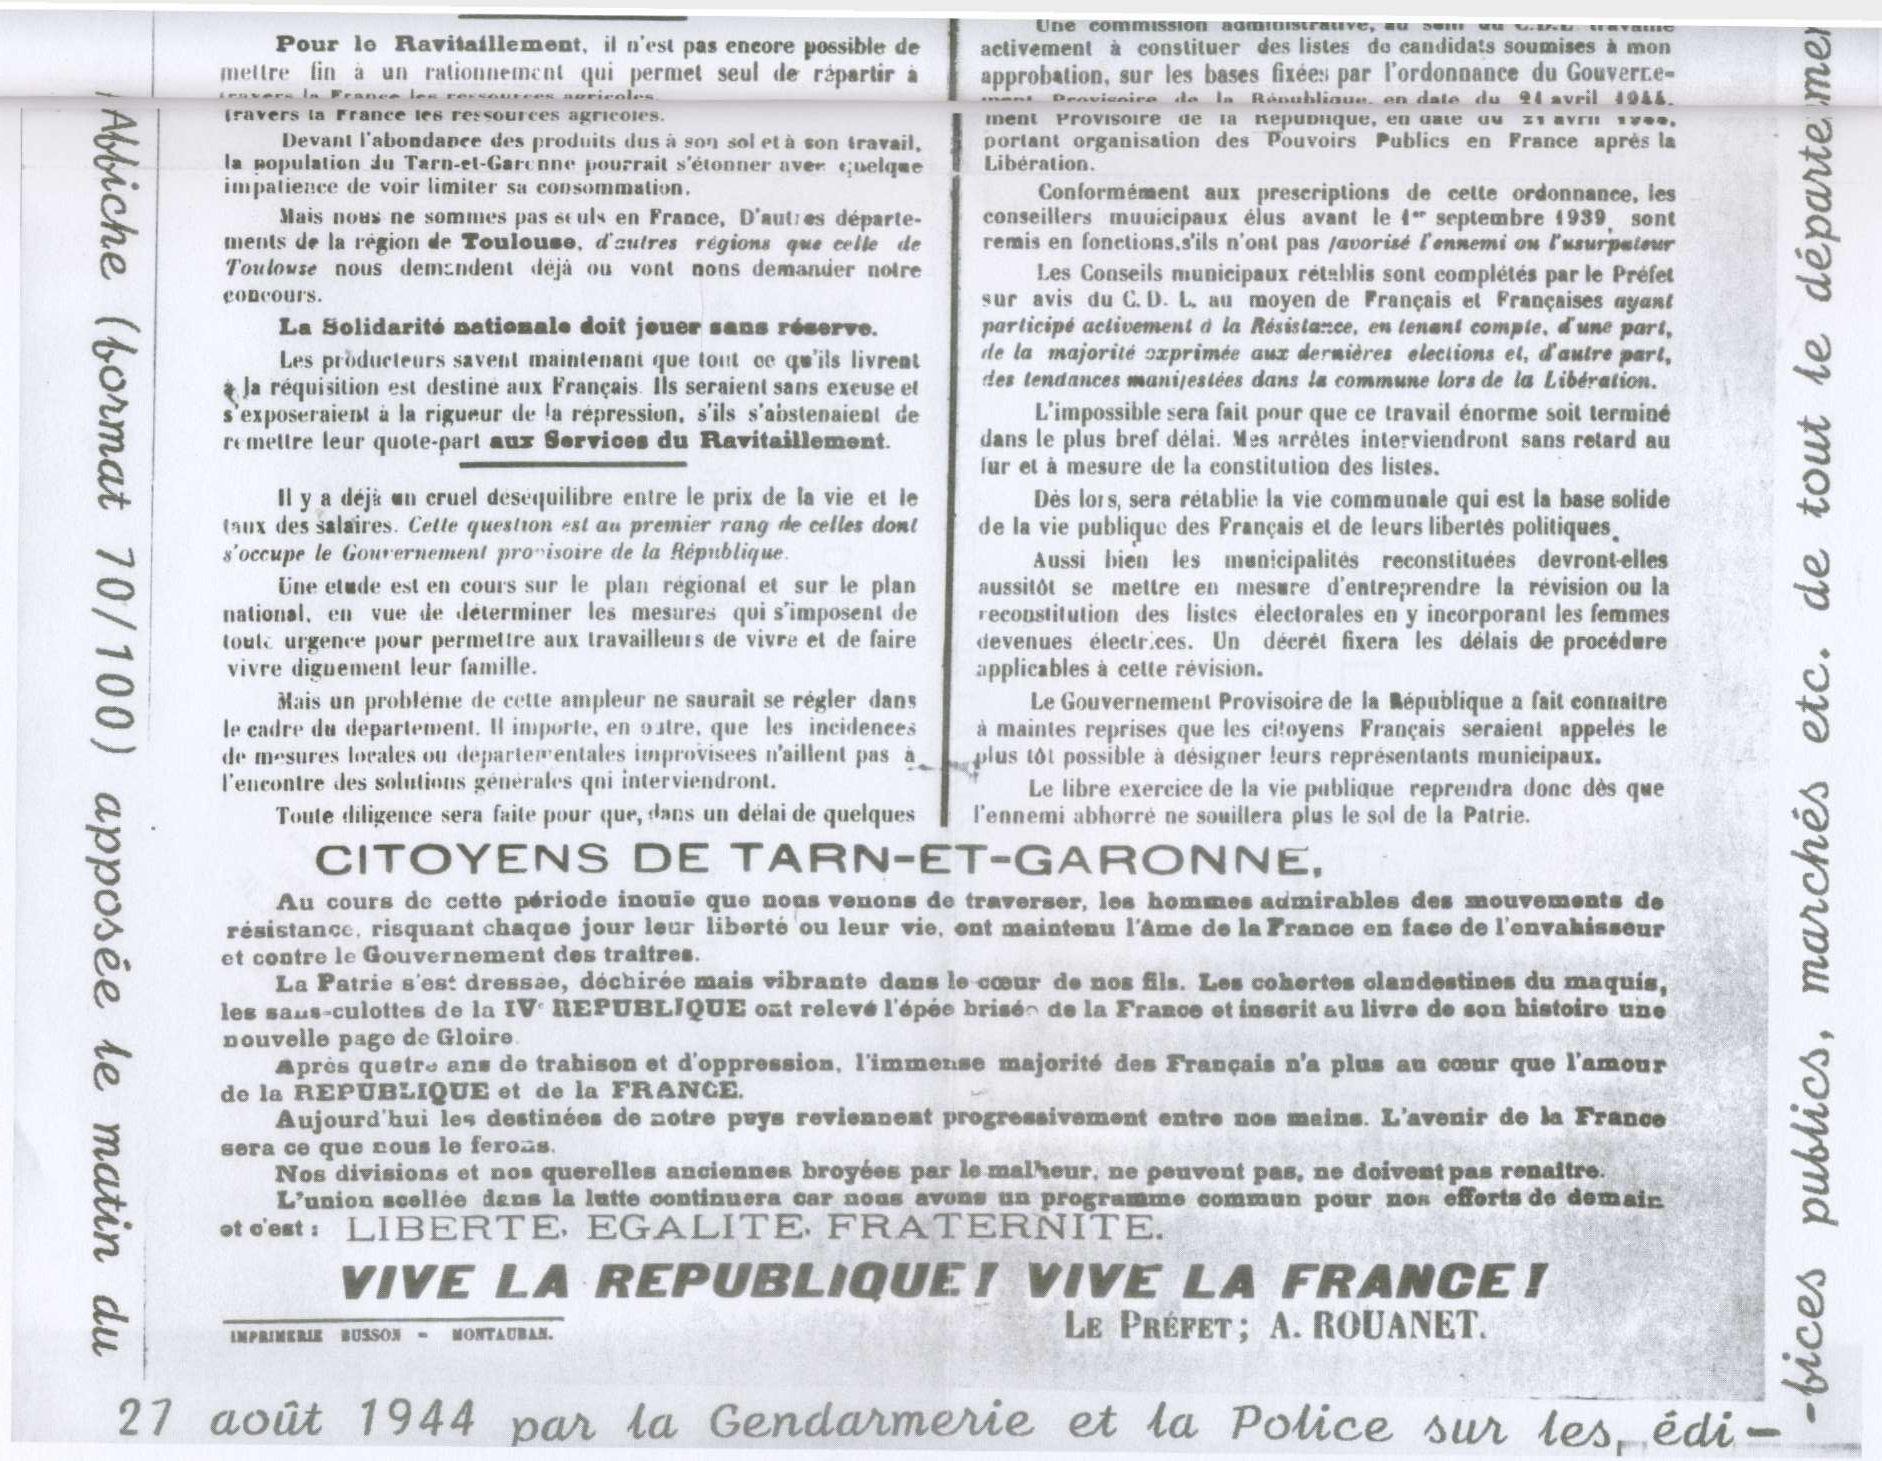 Tome3-Memoire-heurs-et-malheursPage27-bis